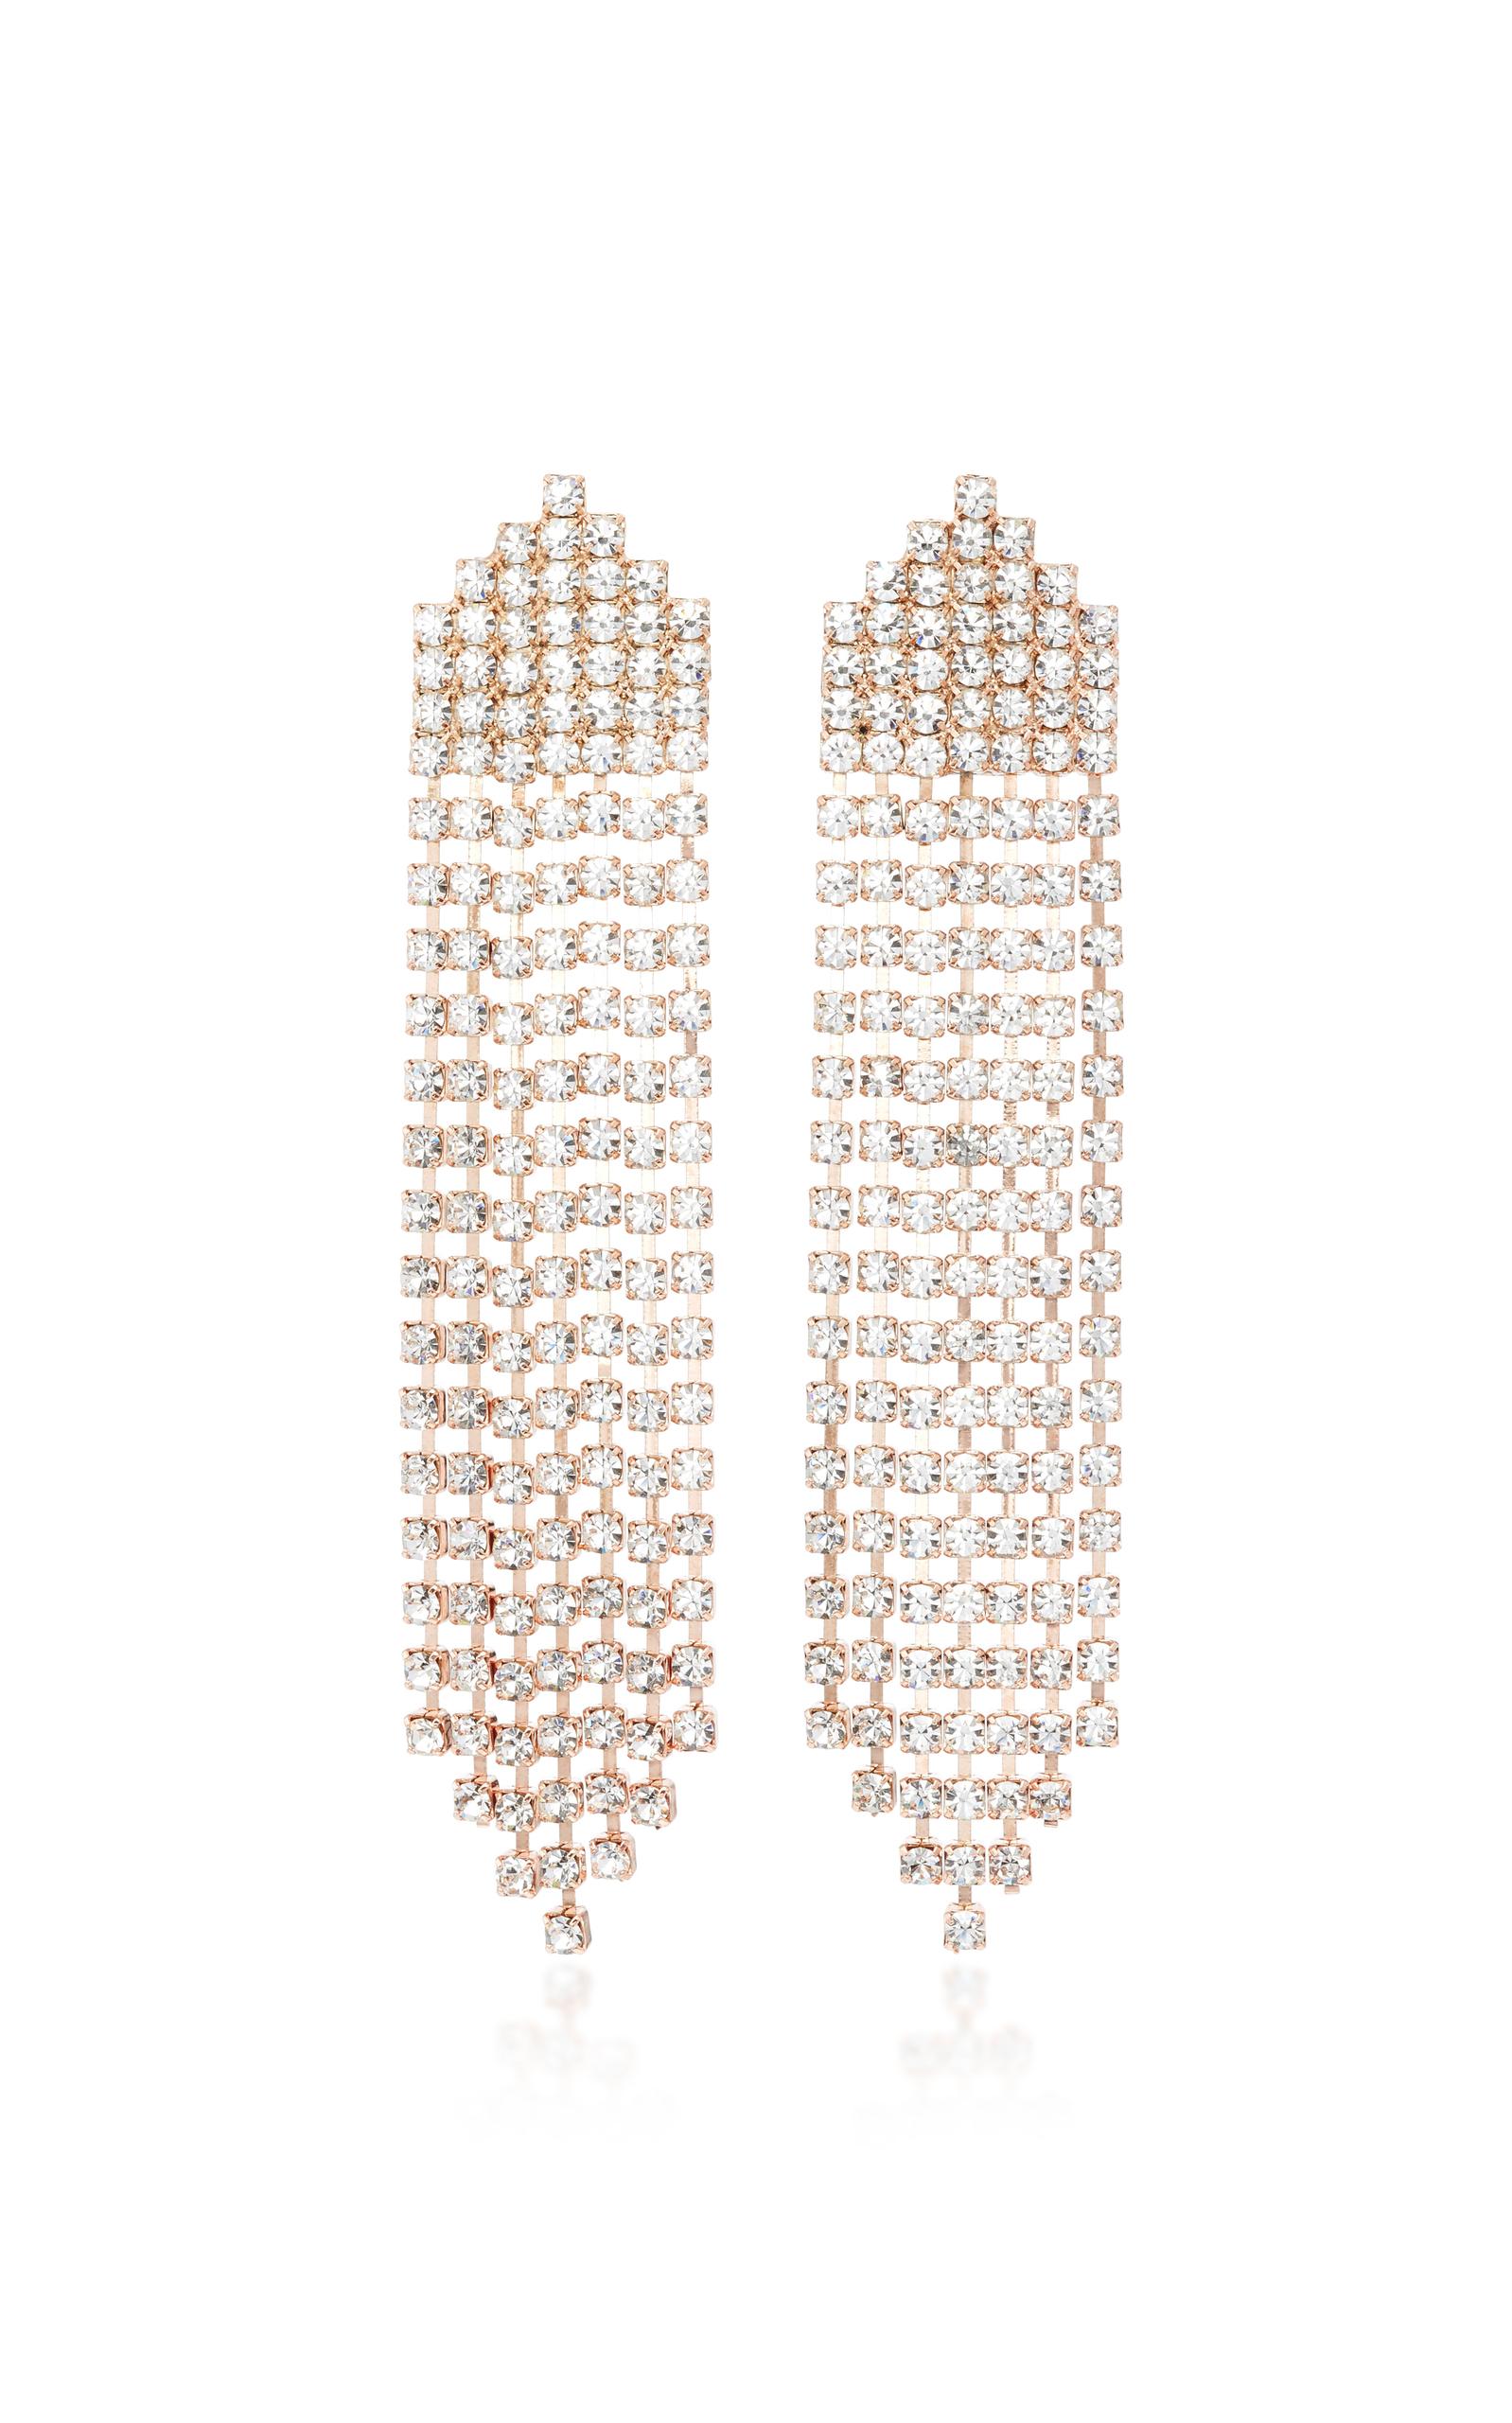 e9f1162e7 Jennifer BehrDiamante Rose Gold-Plated Tassel Earrings. CLOSE. Loading